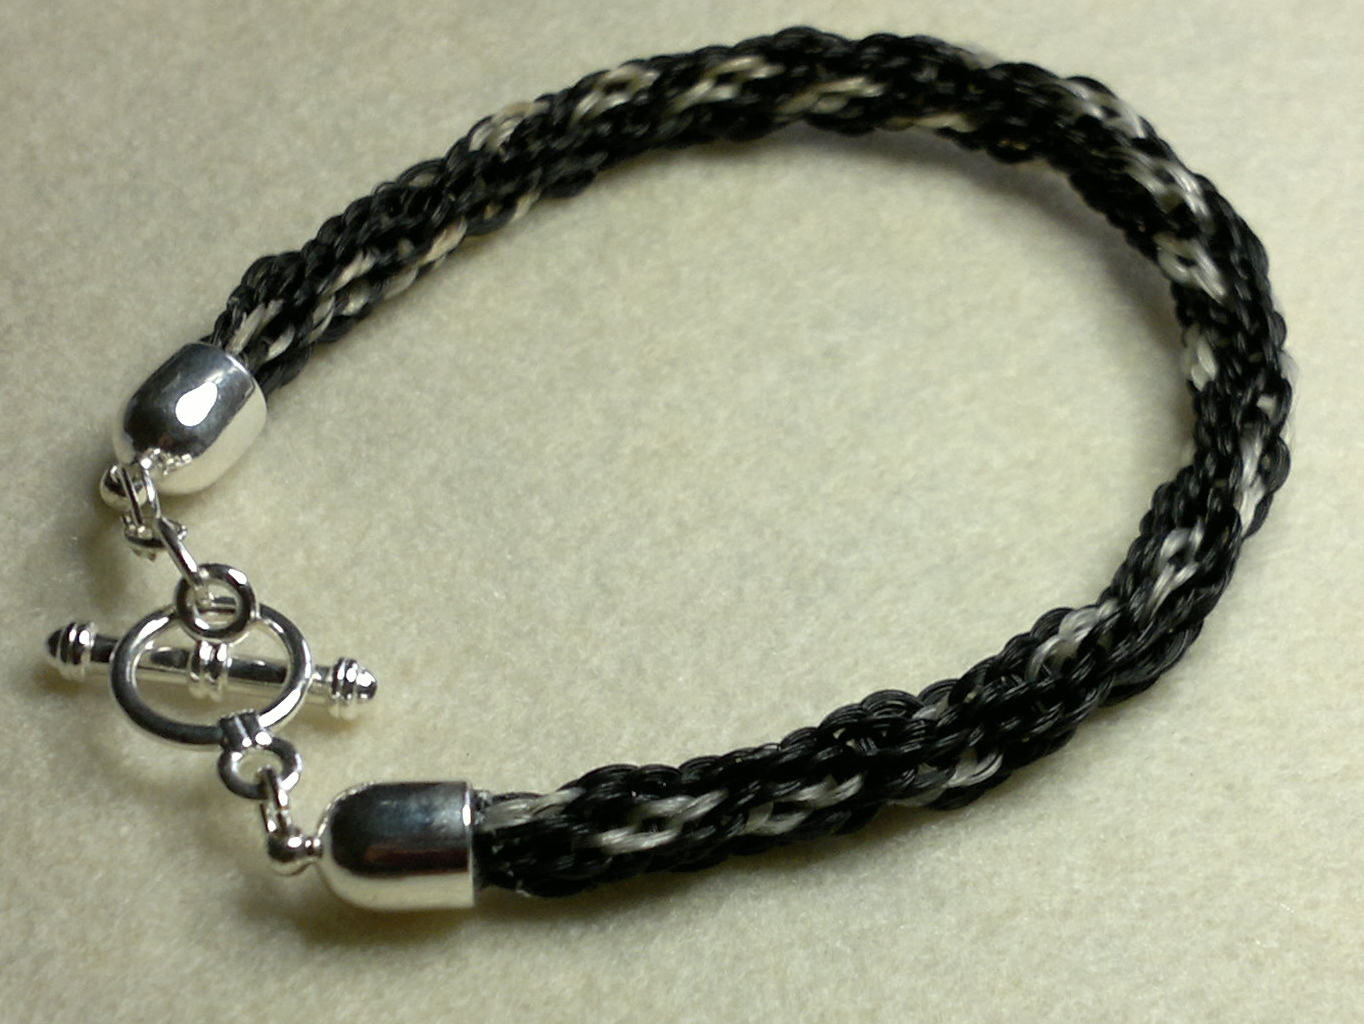 Superb The Horsehair Bracelet Project Short Hairstyles Gunalazisus